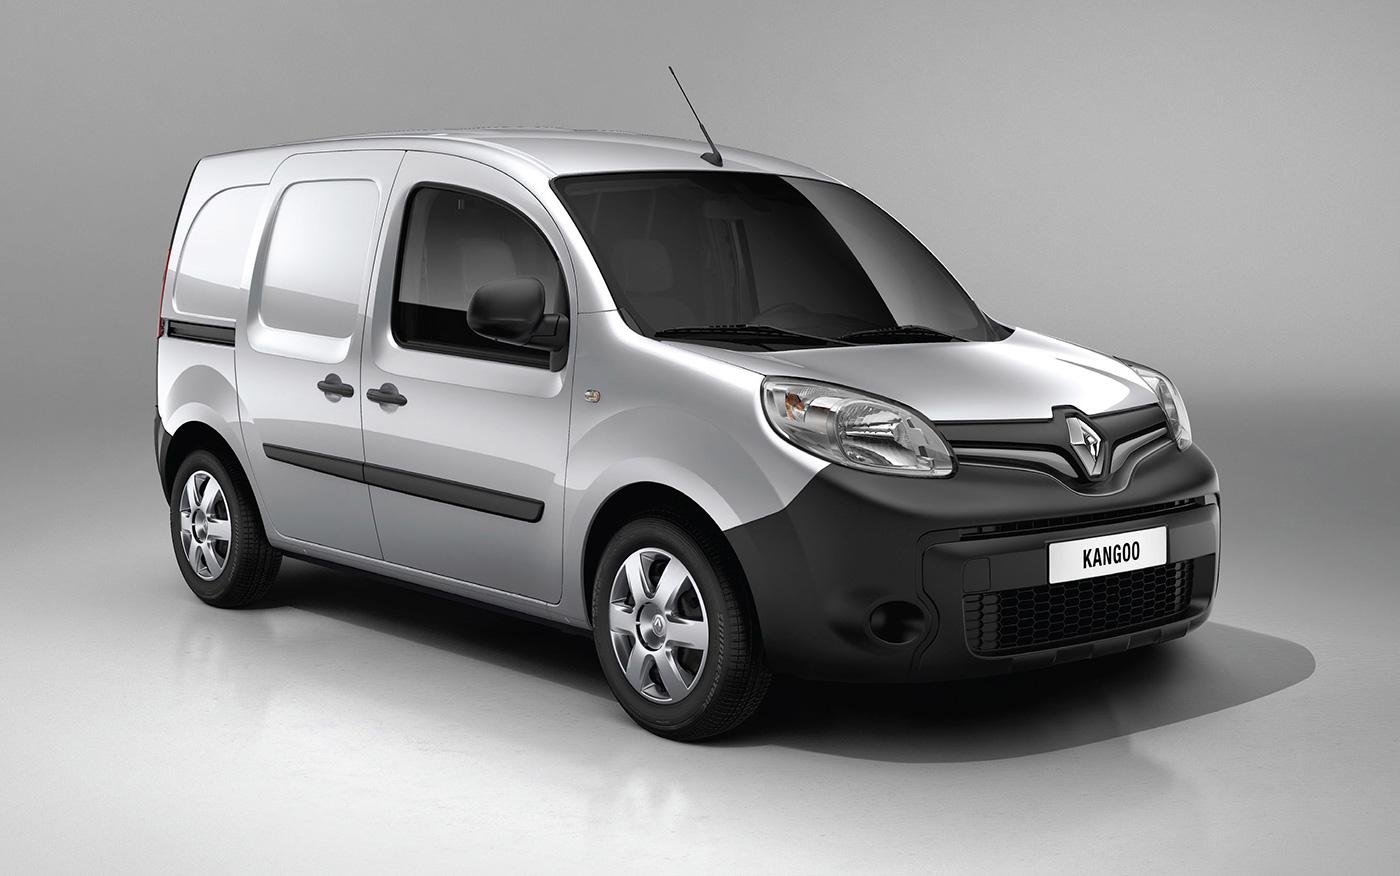 Renault Kangoo Ml 19 Energy DCi 90 Business